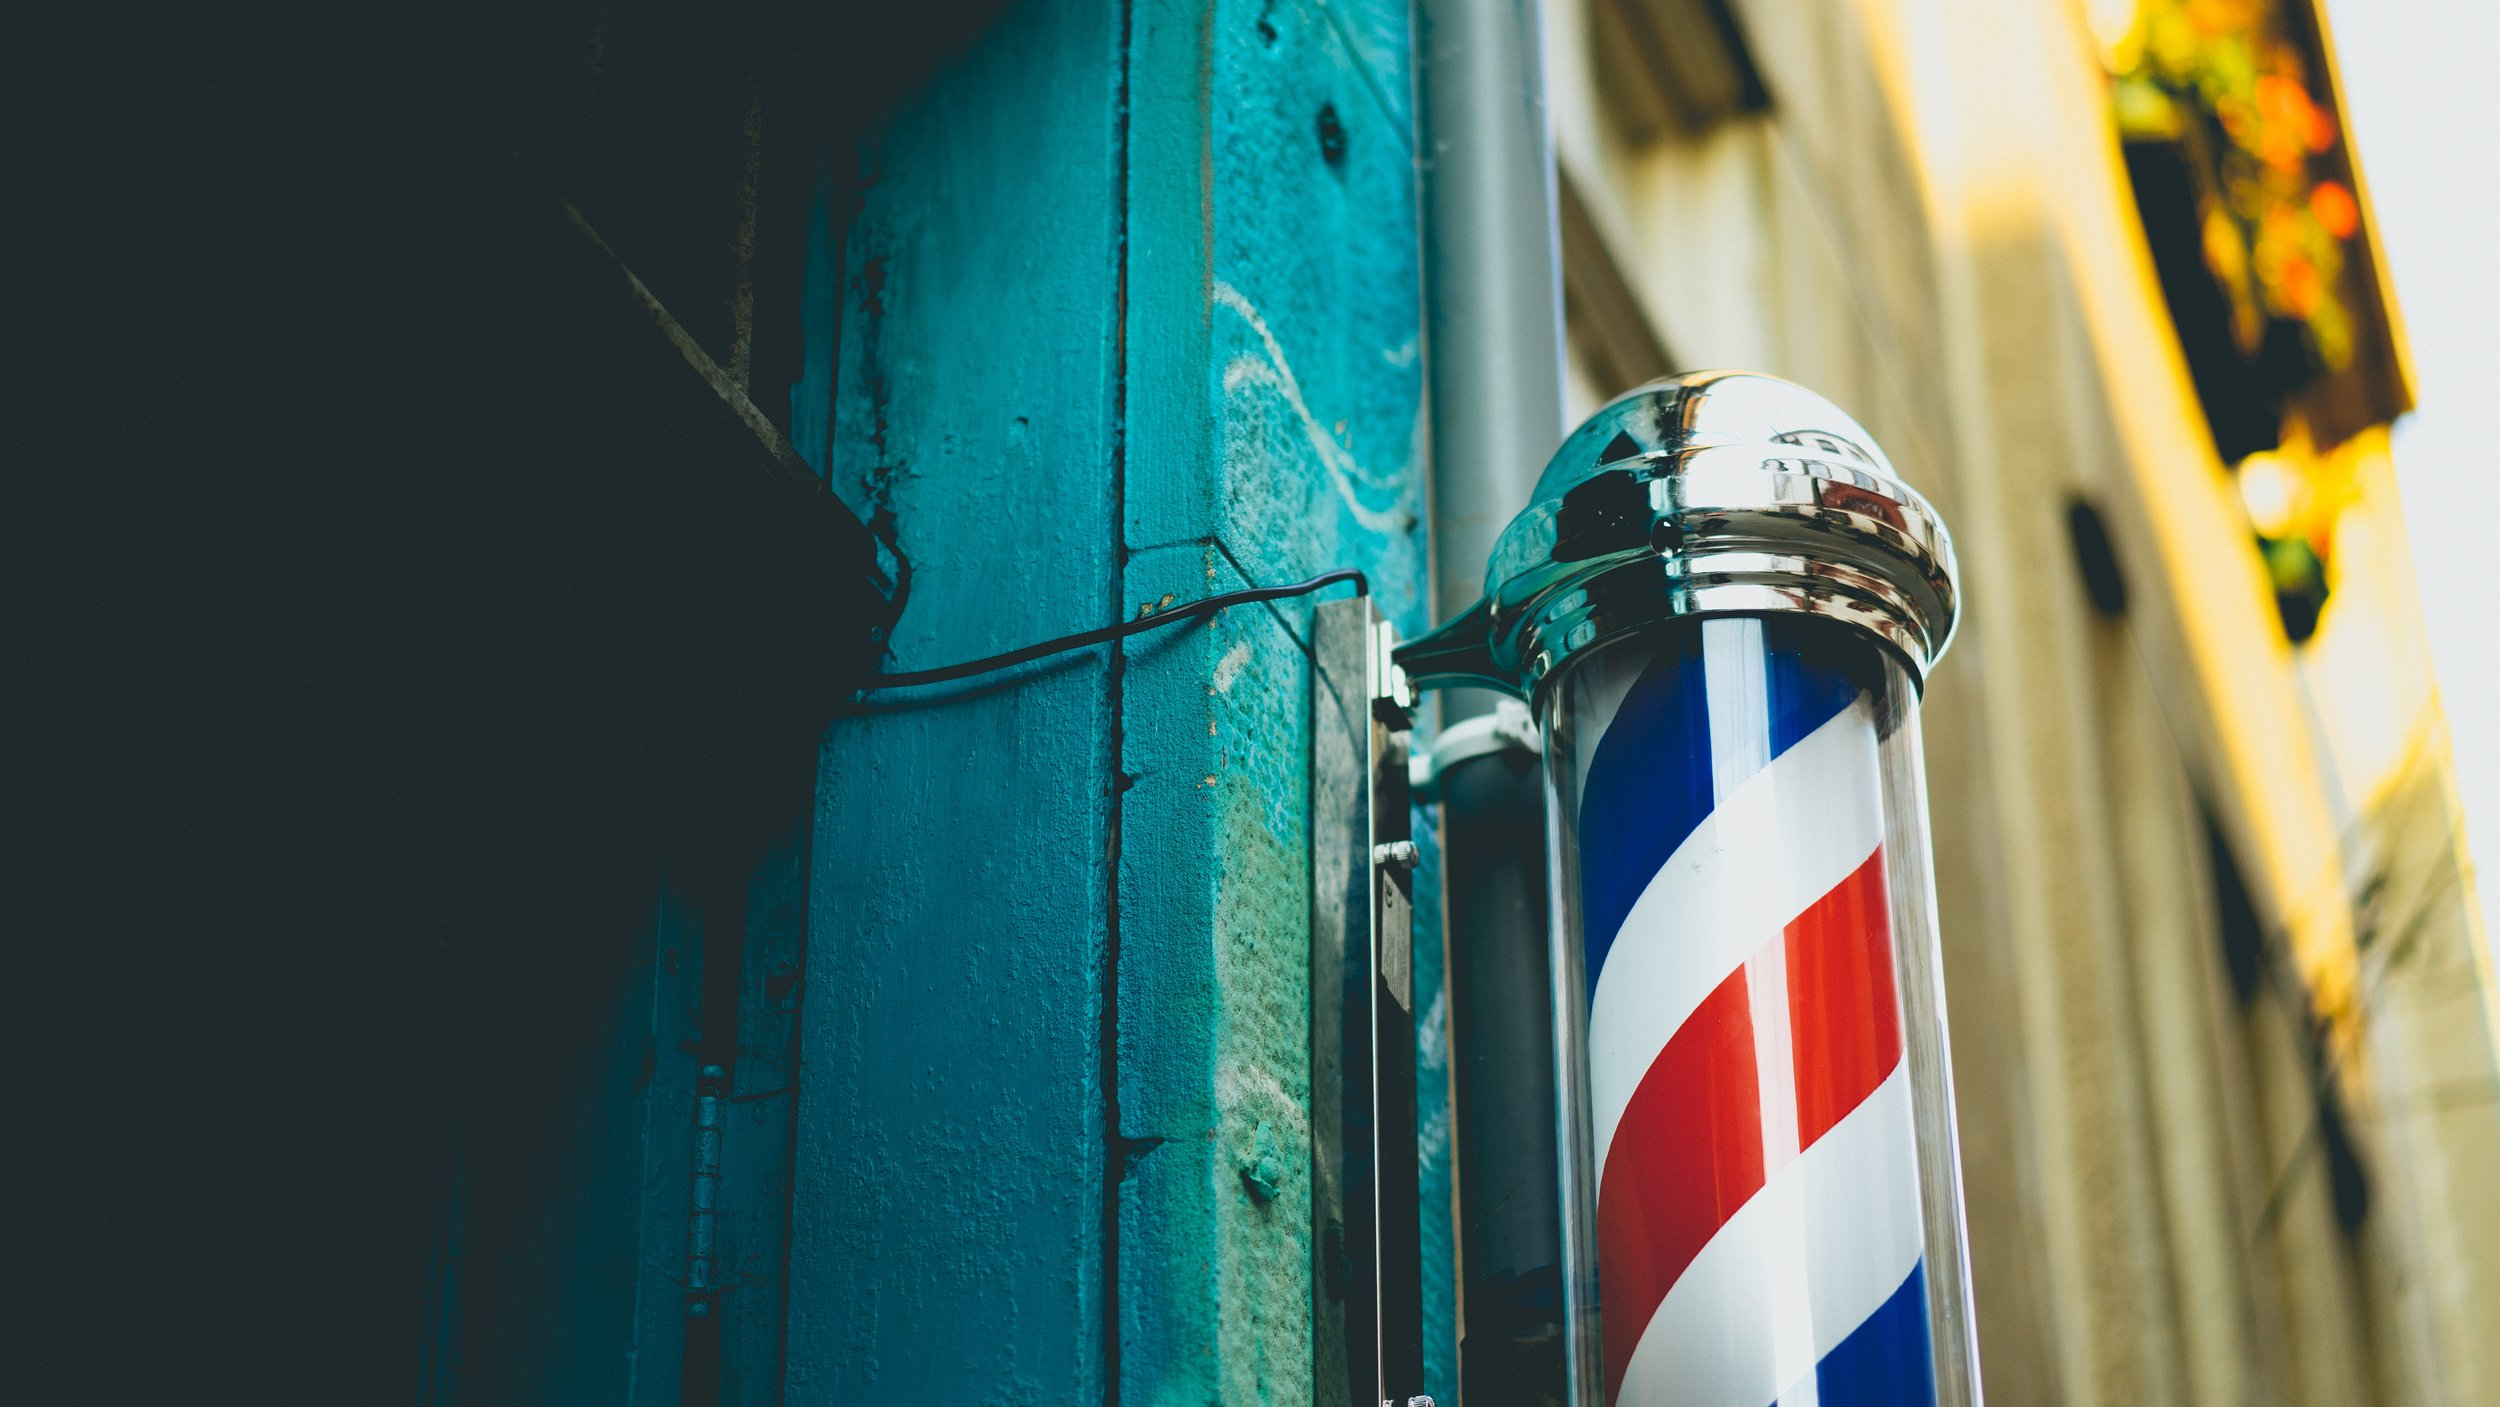 Jake Ostreicher, Bandit To Barber To Business Self-Starter